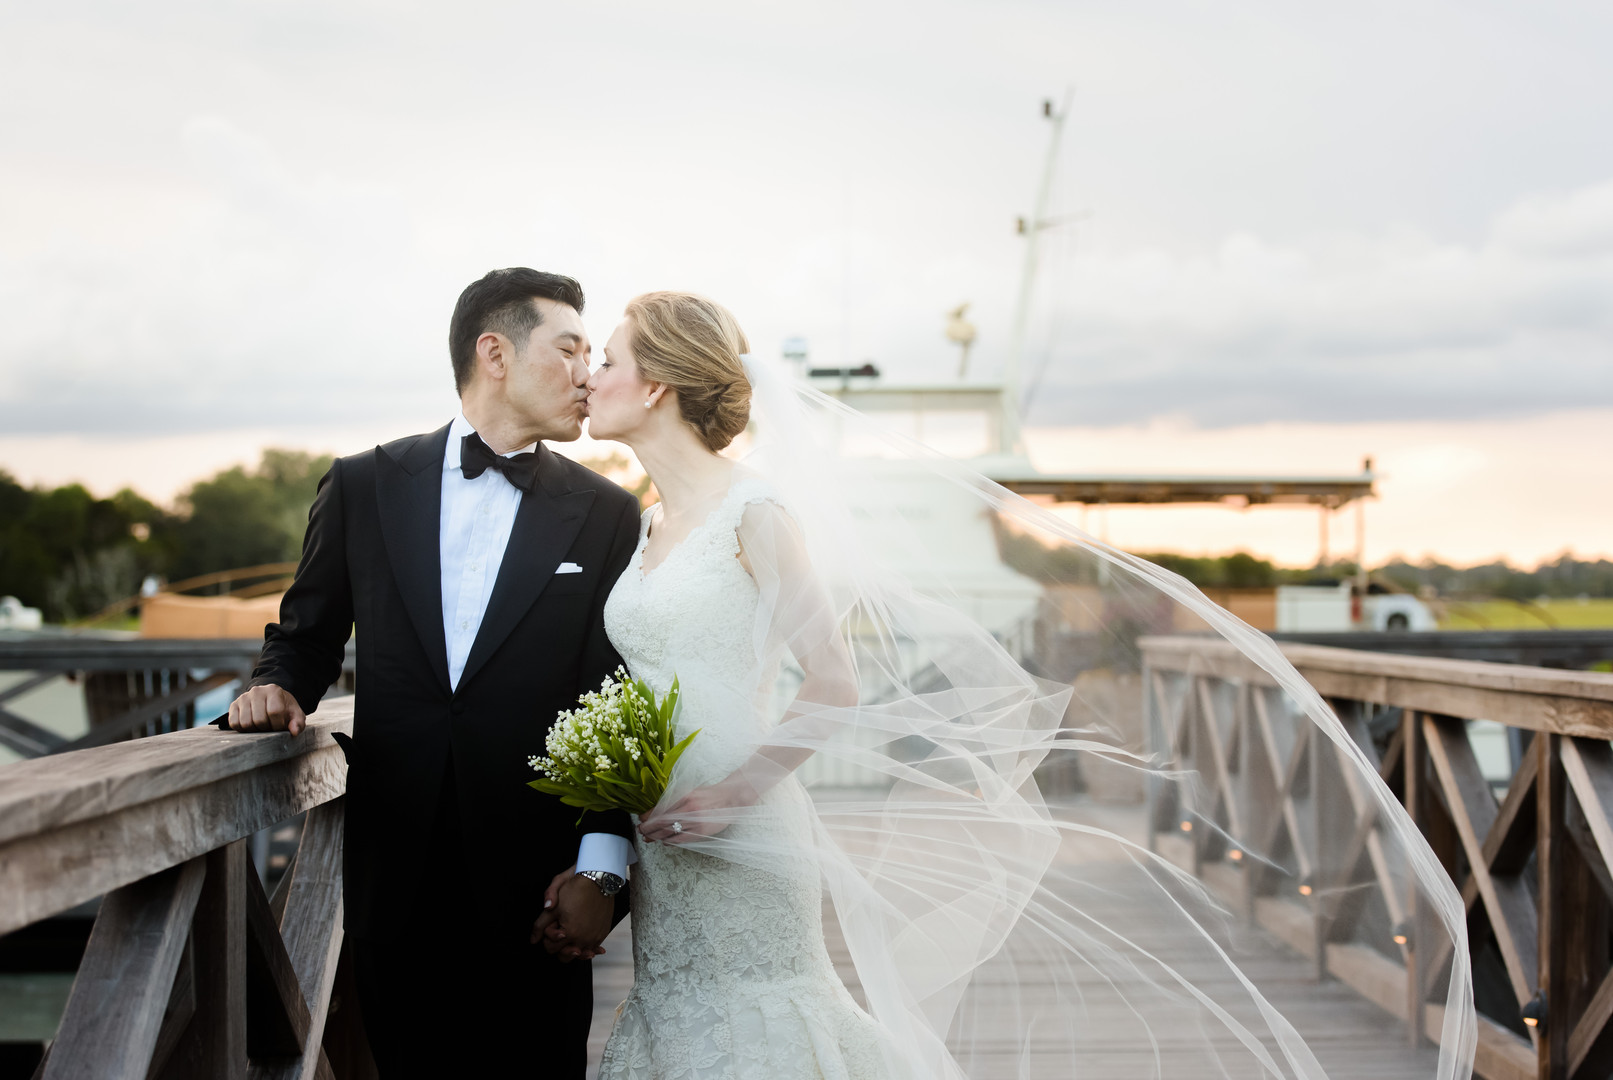 the-cloister-at-sea-island-wedding-1.JPG